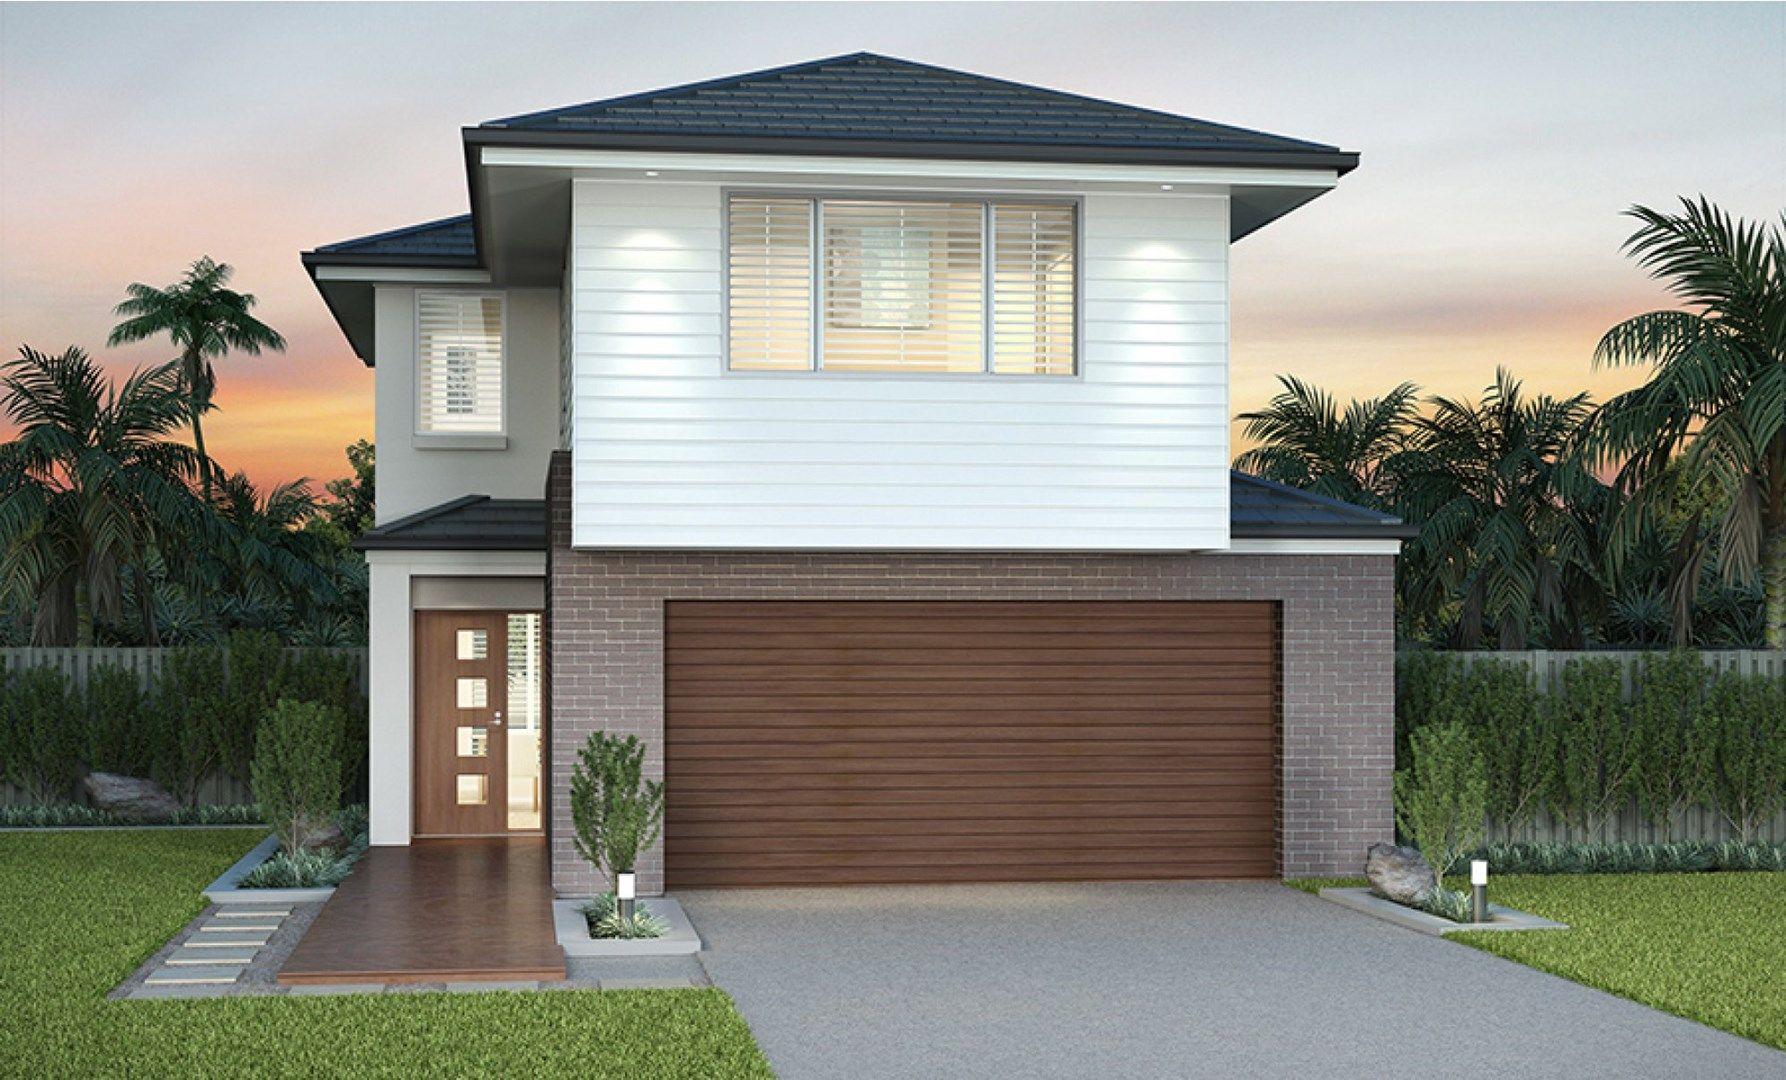 Lot 100 Carnarvon Close, Mango Hill QLD 4509, Image 0